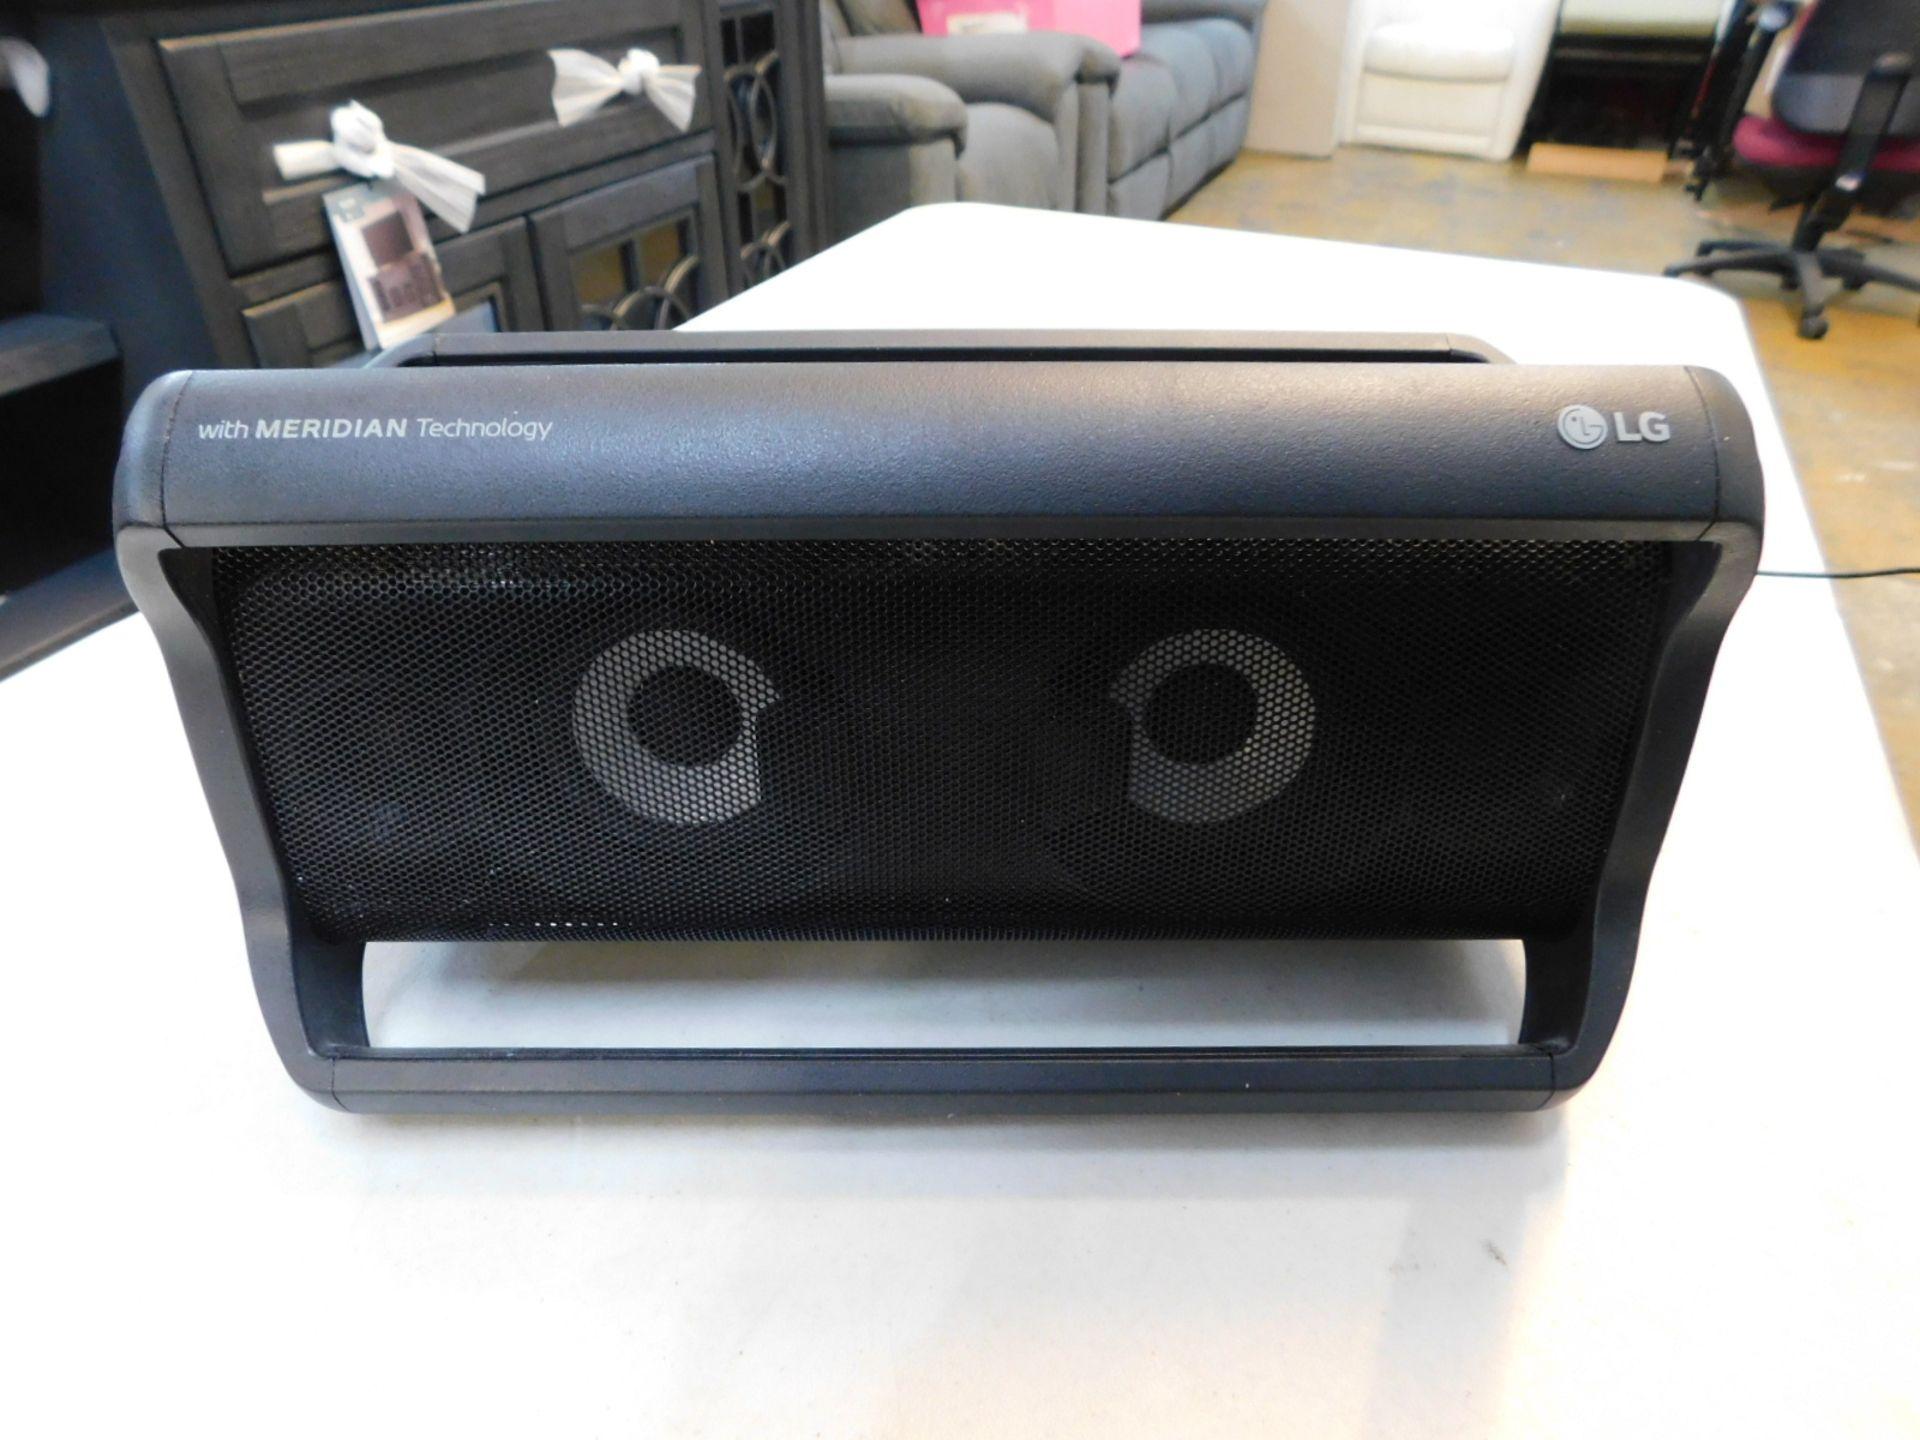 1 LG PK7 PORTABLE SPEAKER WITH MERIDIAN TECHNOLOGY RRP £199